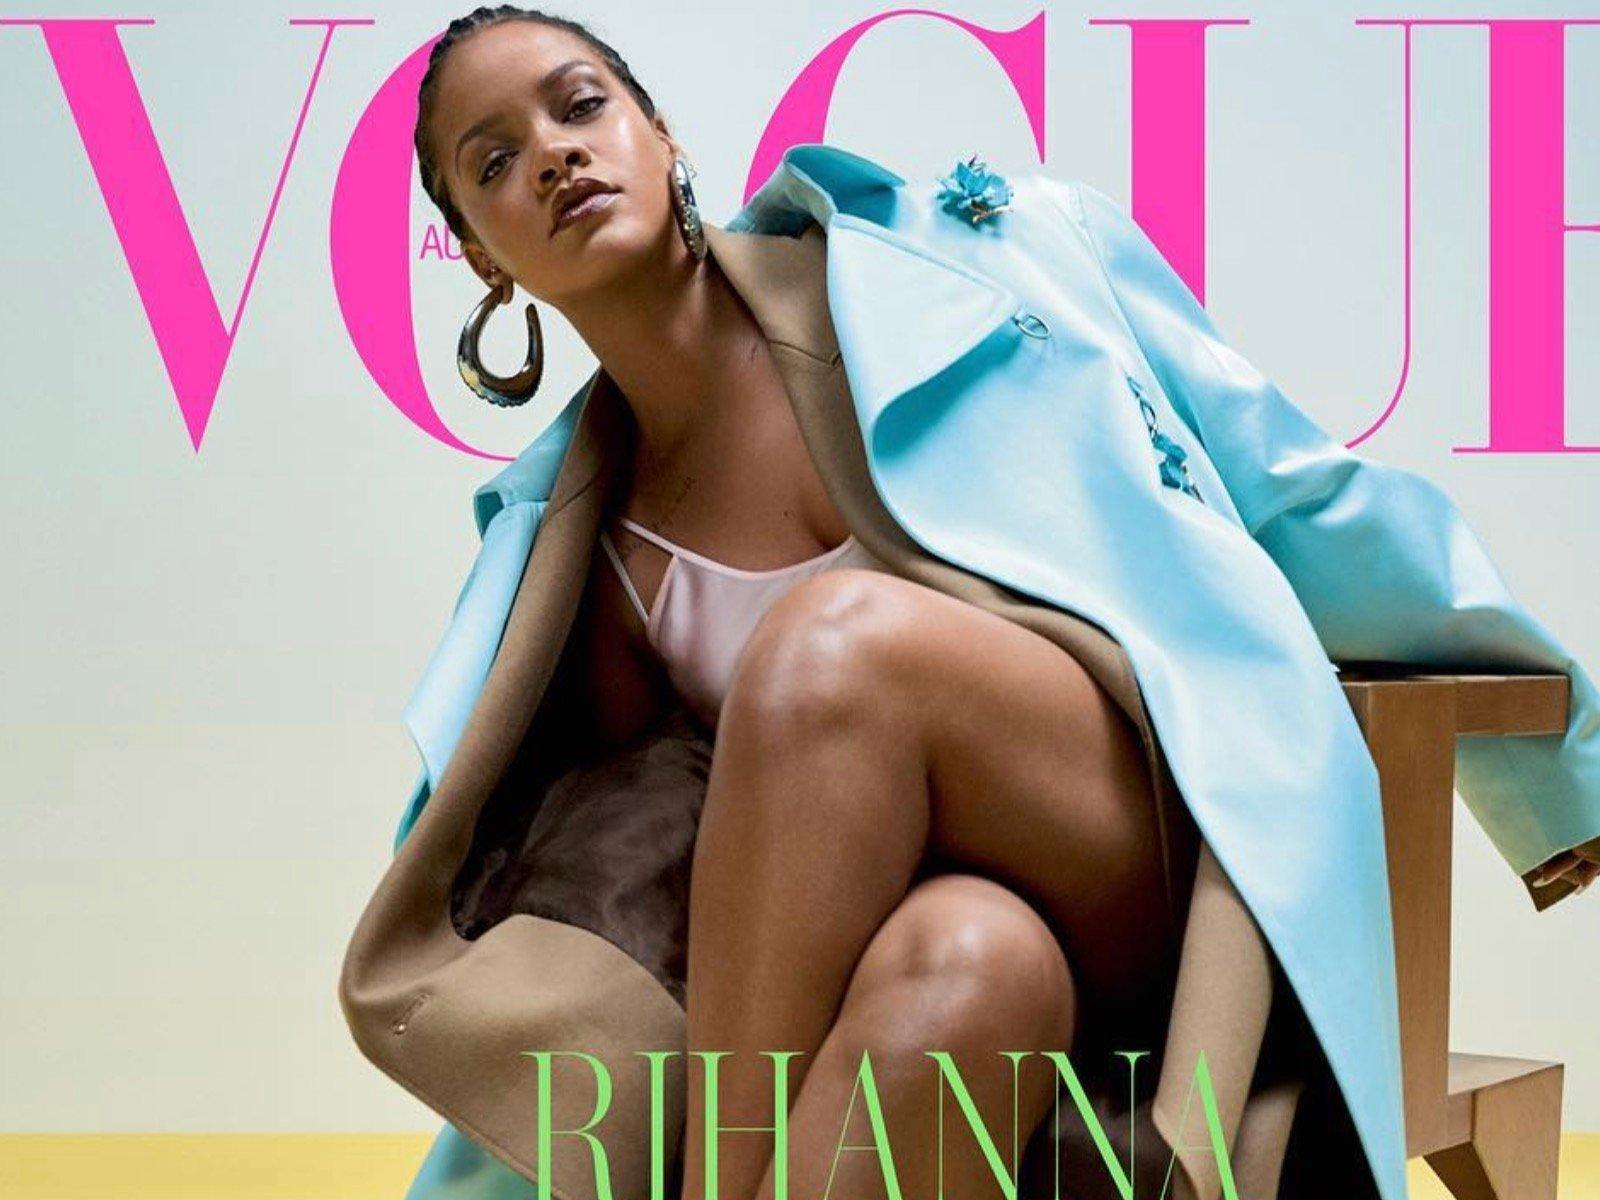 VOGUE Australia Rihanna